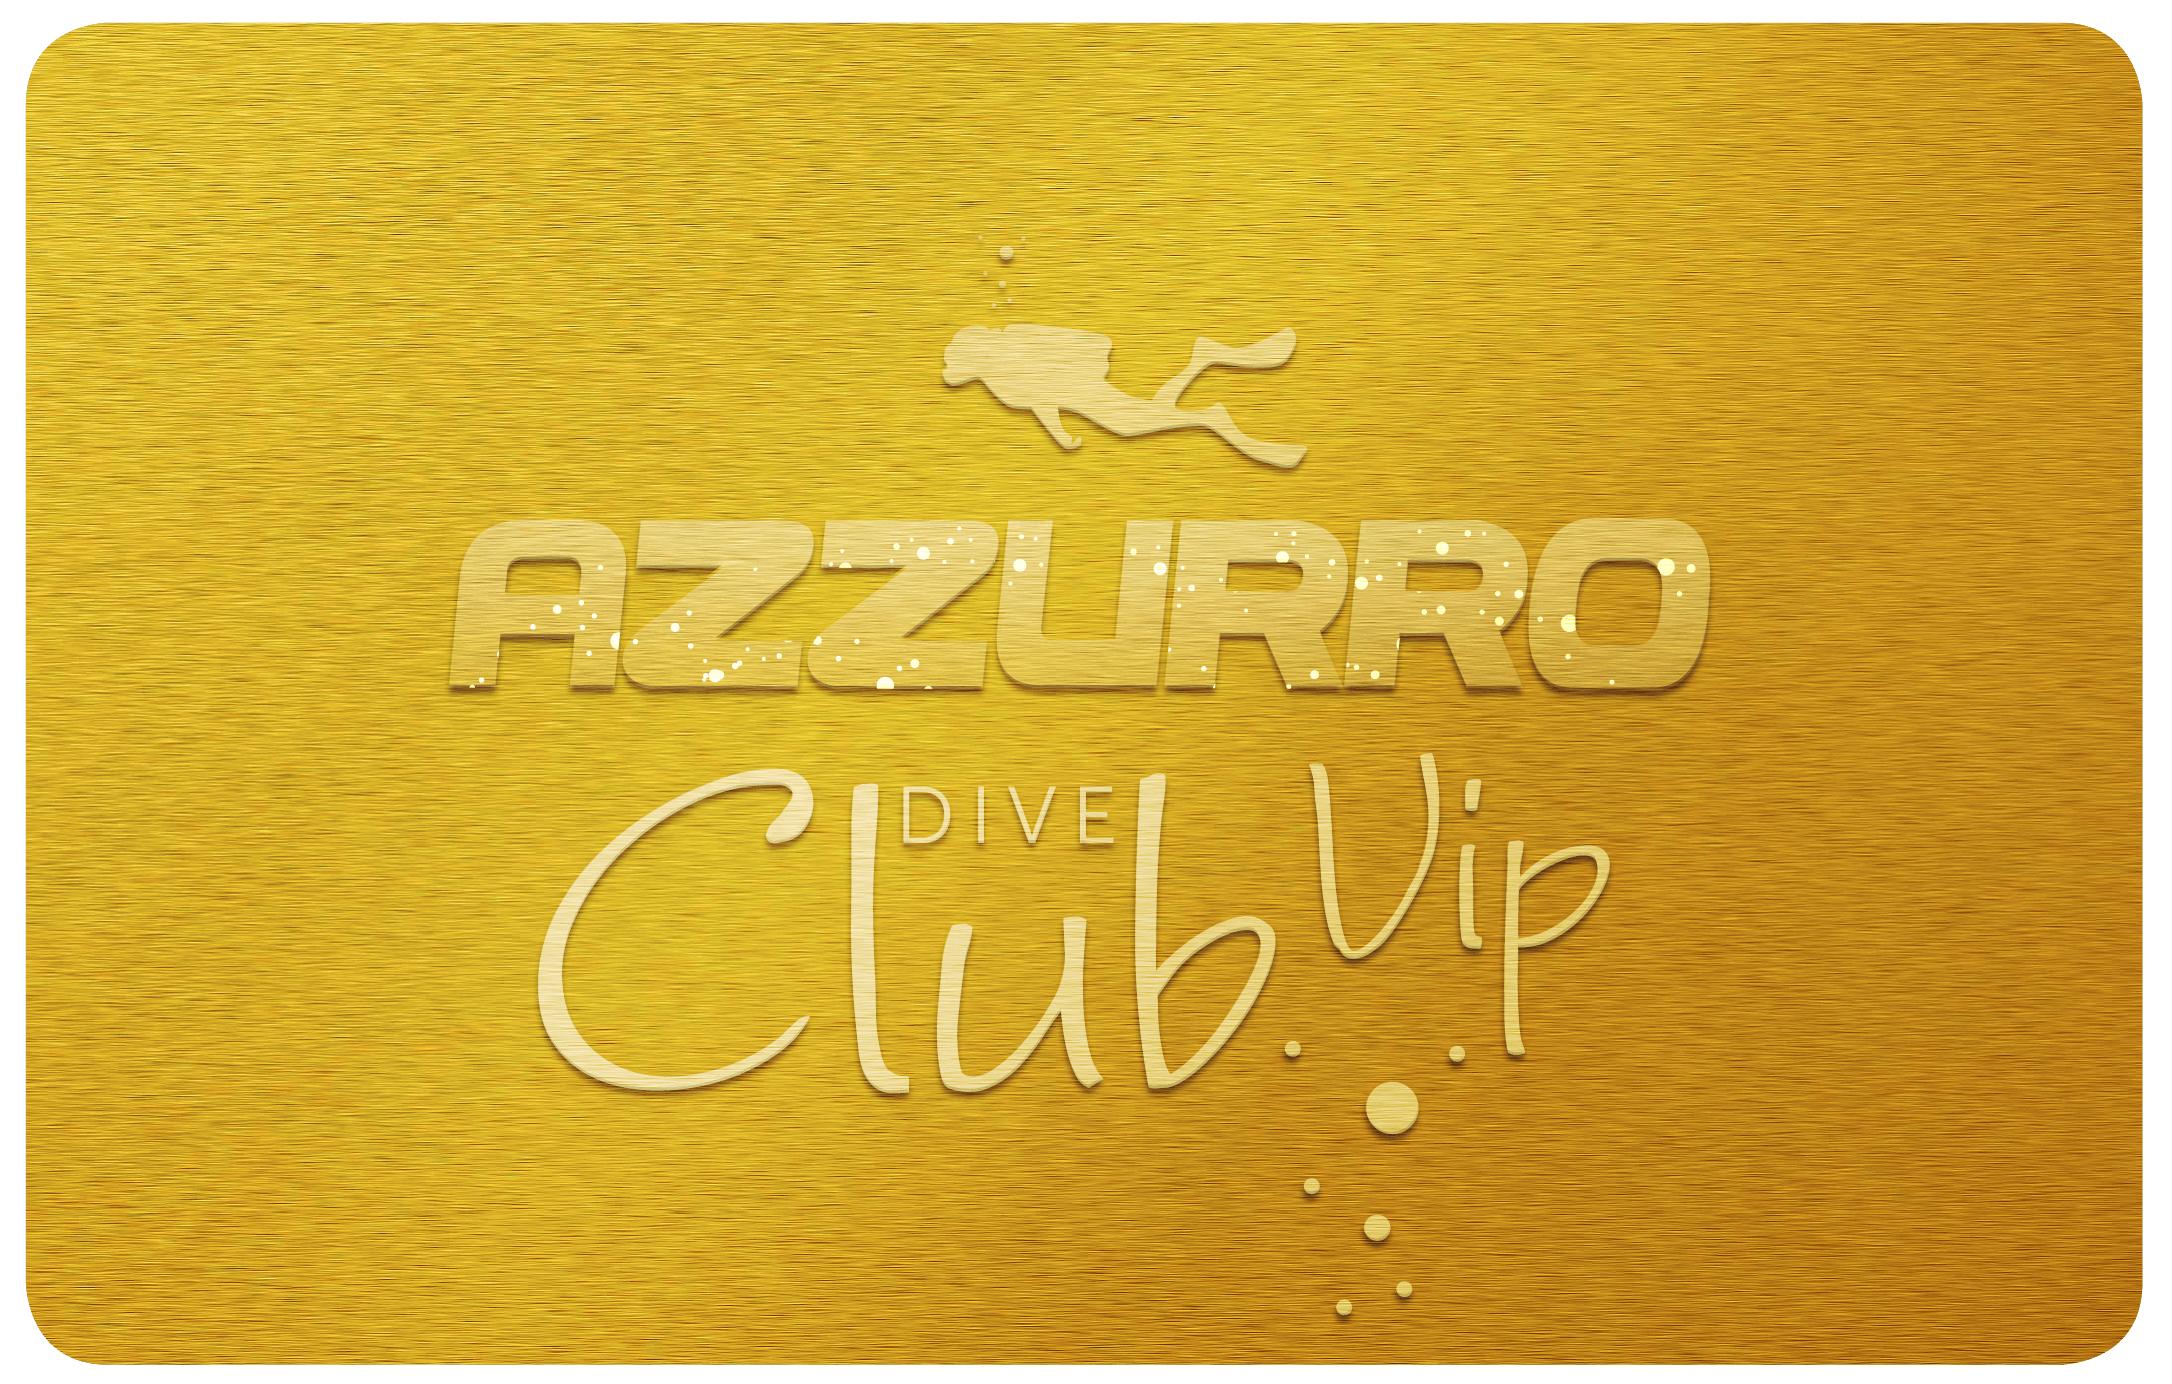 Azzurro Dive Club - VIP